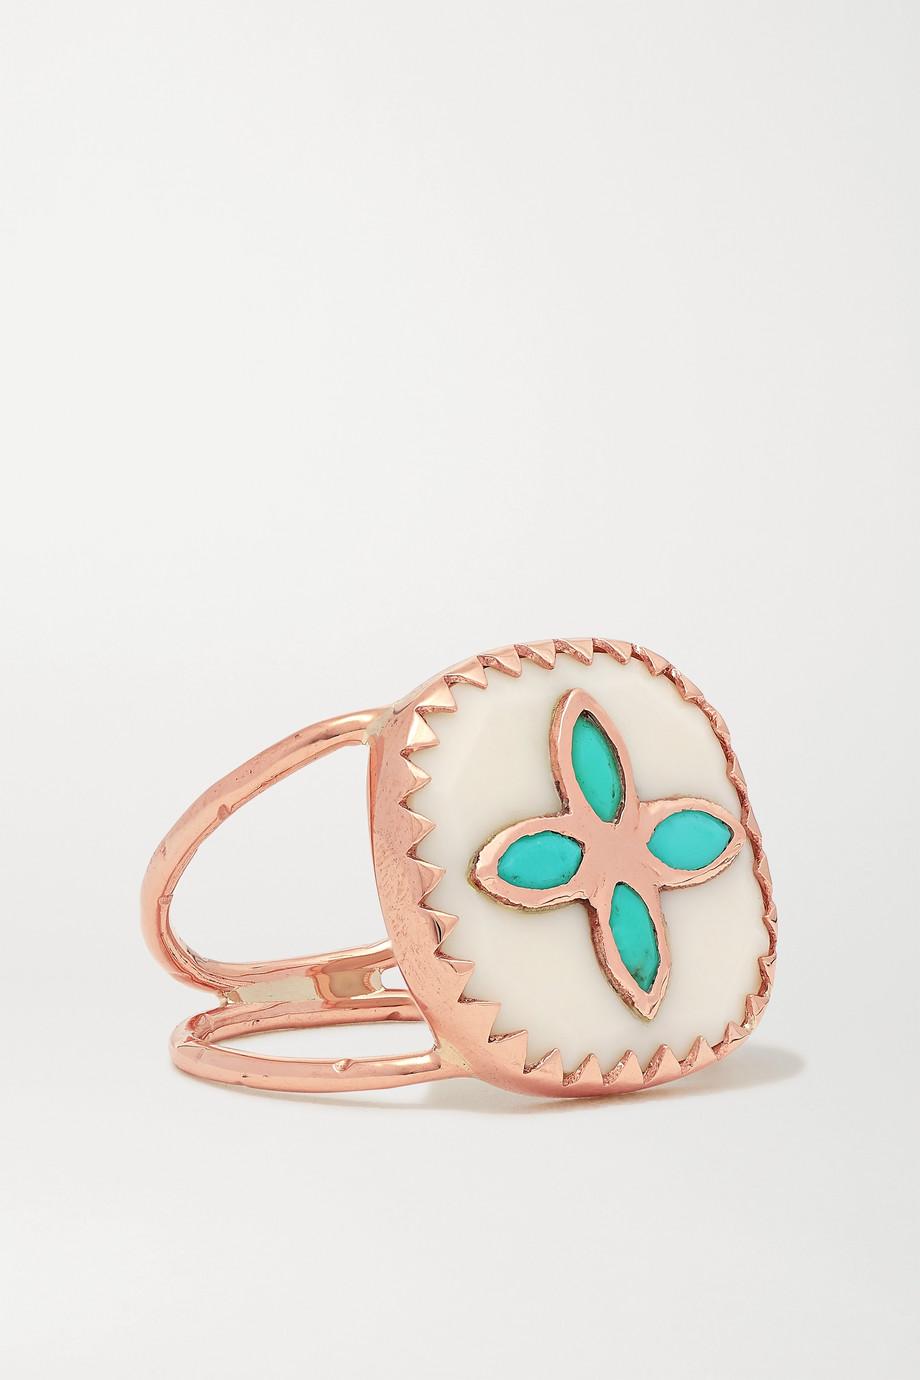 Pascale Monvoisin Bowie N°2 9K 玫瑰金、树脂、绿松石戒指